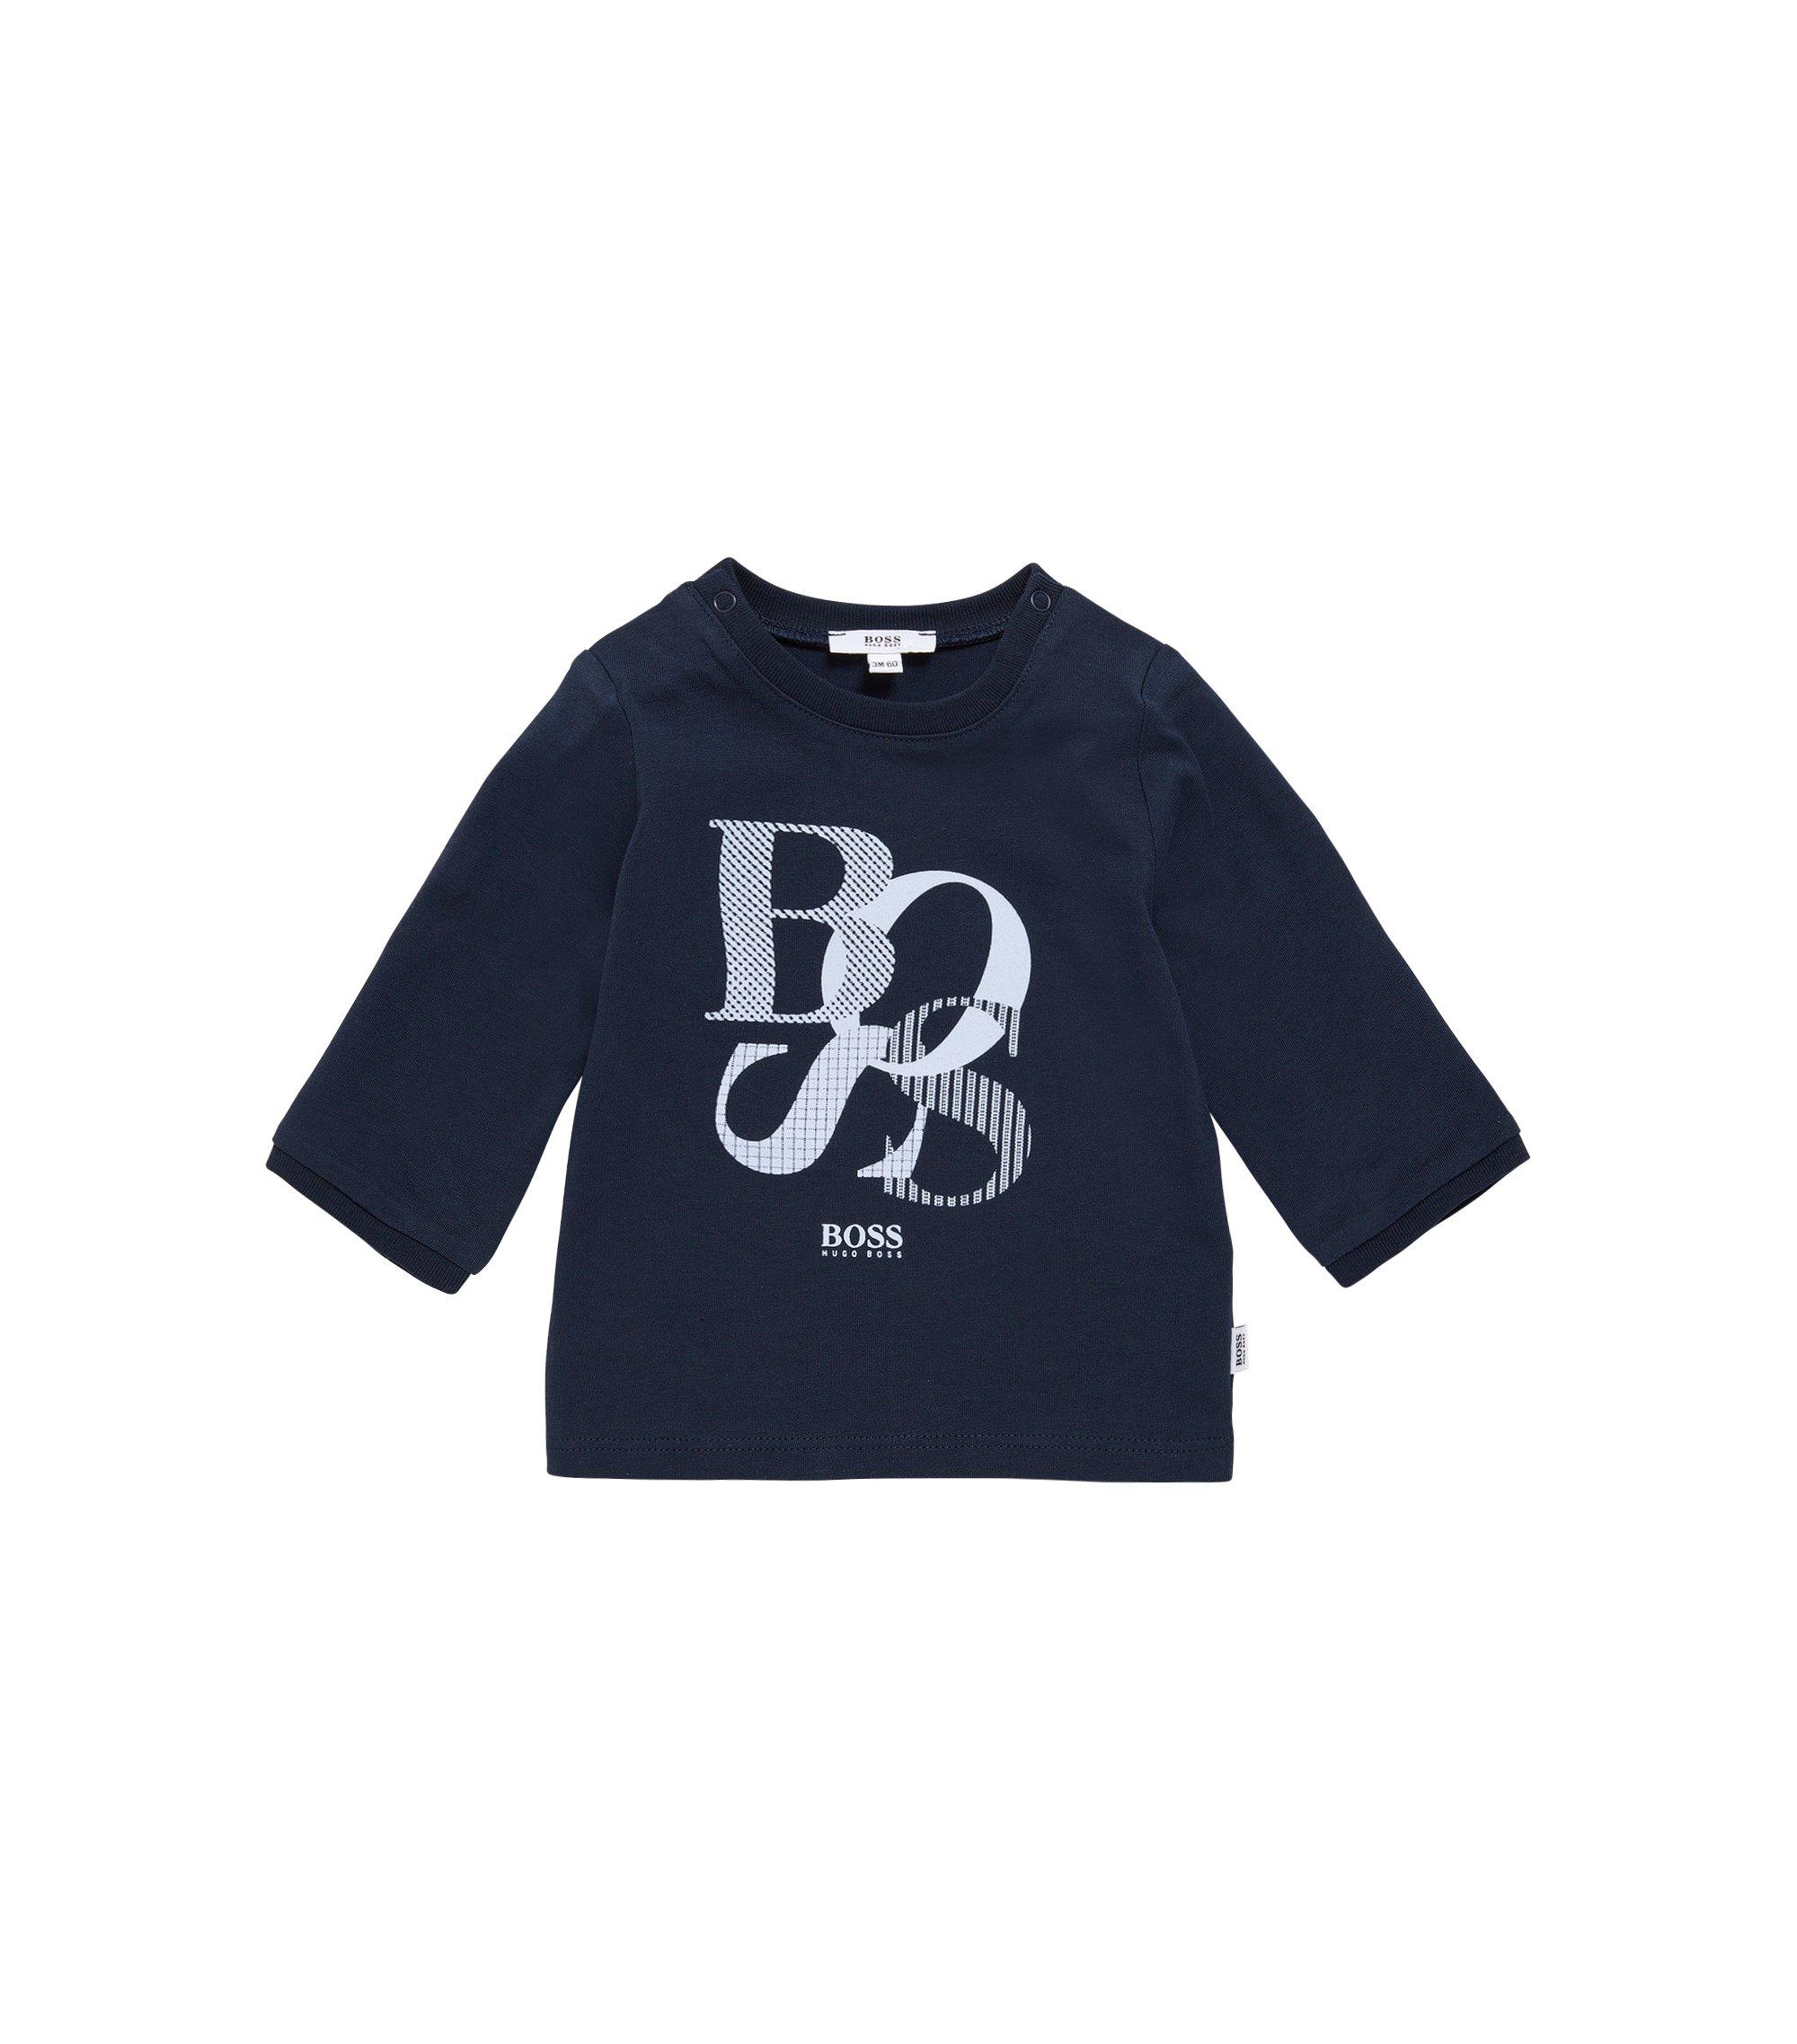 Camiseta de manga larga para bebé de algodón con estampado: 'J95214', Azul oscuro